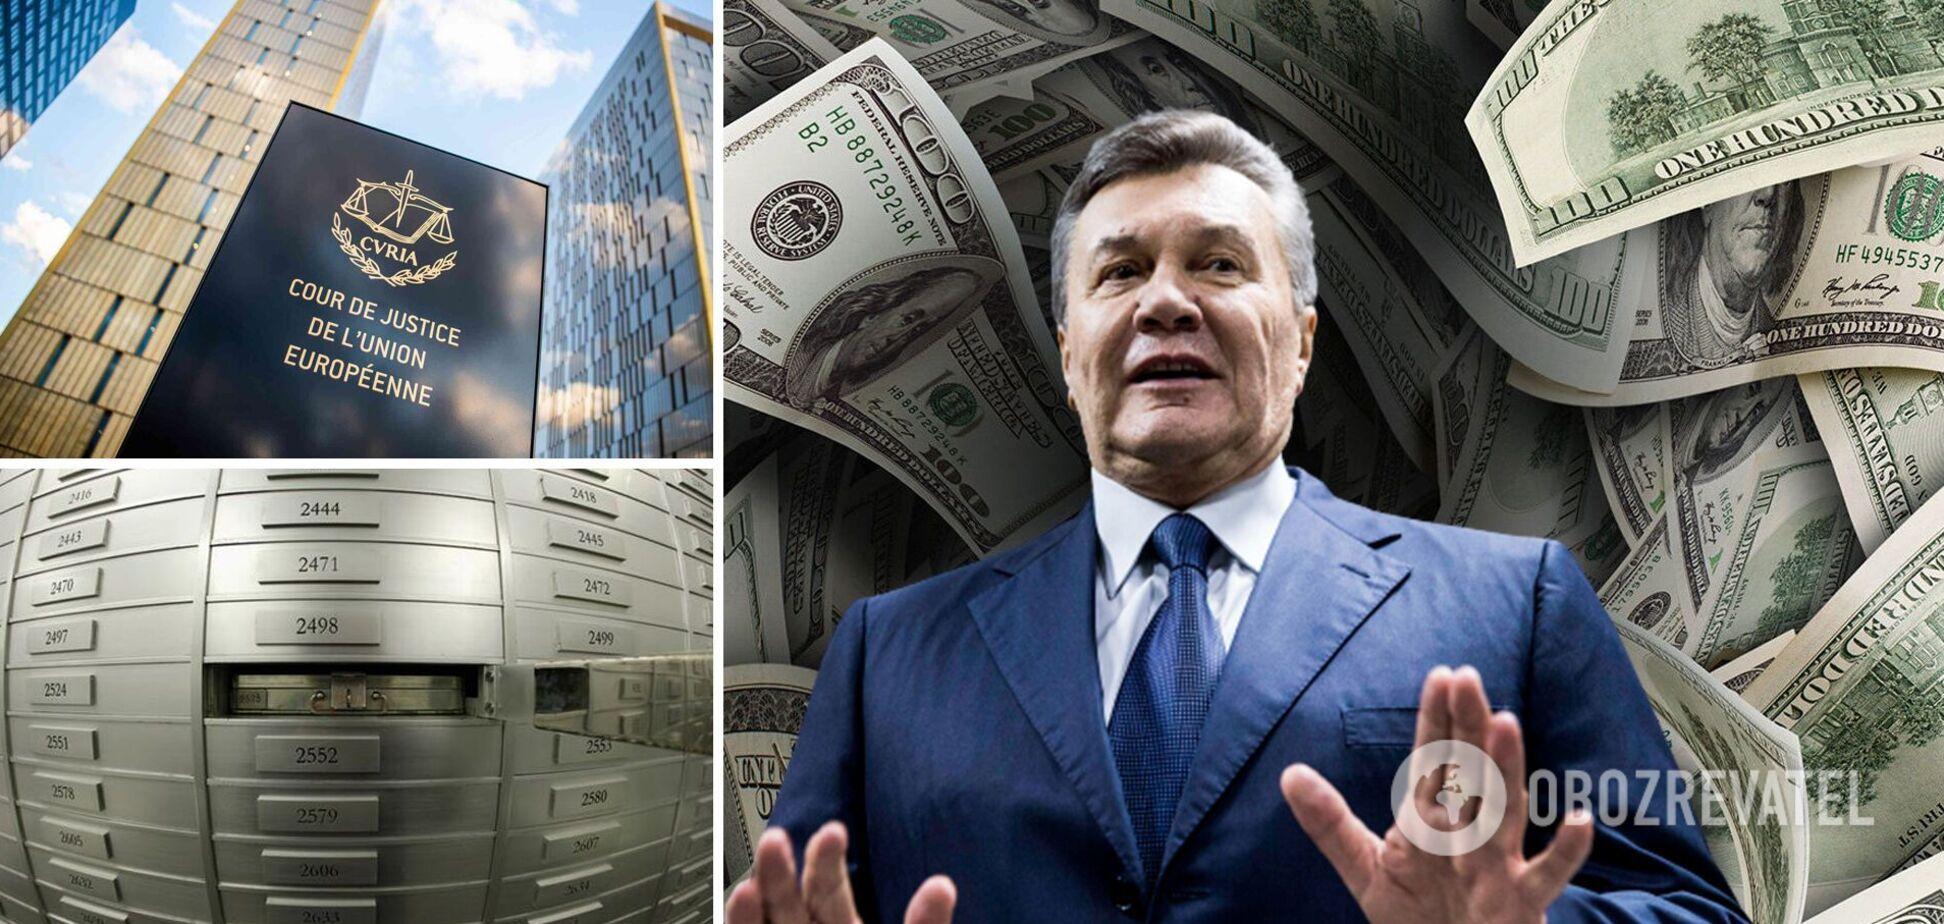 Активы Януковича разблокируют? Что означает снятие санкций ЕС и как реагируют правоохранители